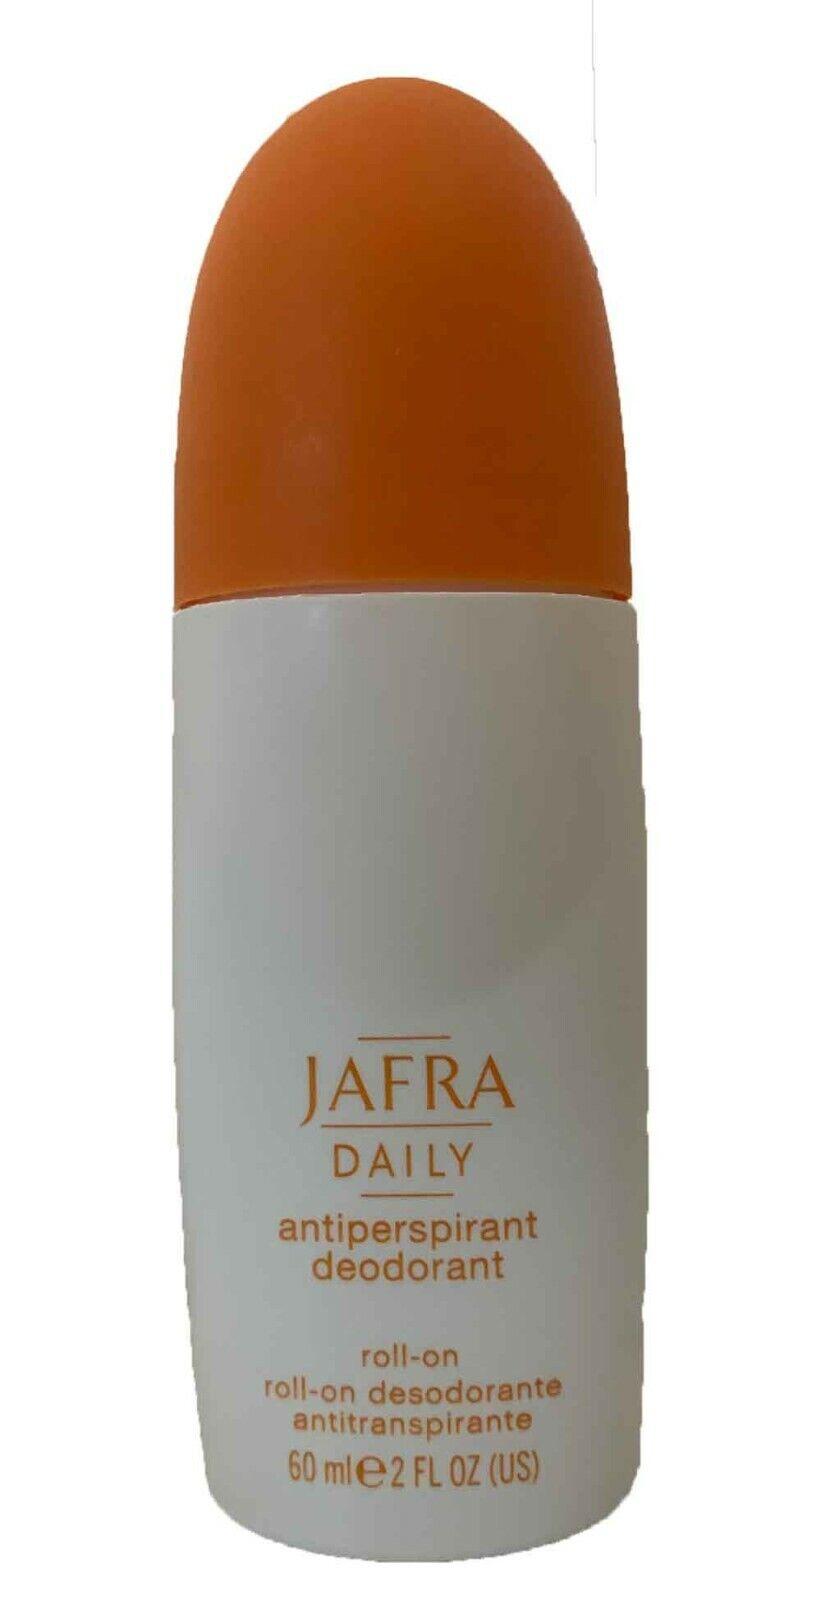 JAFRA • Antiperspirant Deostick • neues Design 2020 orange • Angebot